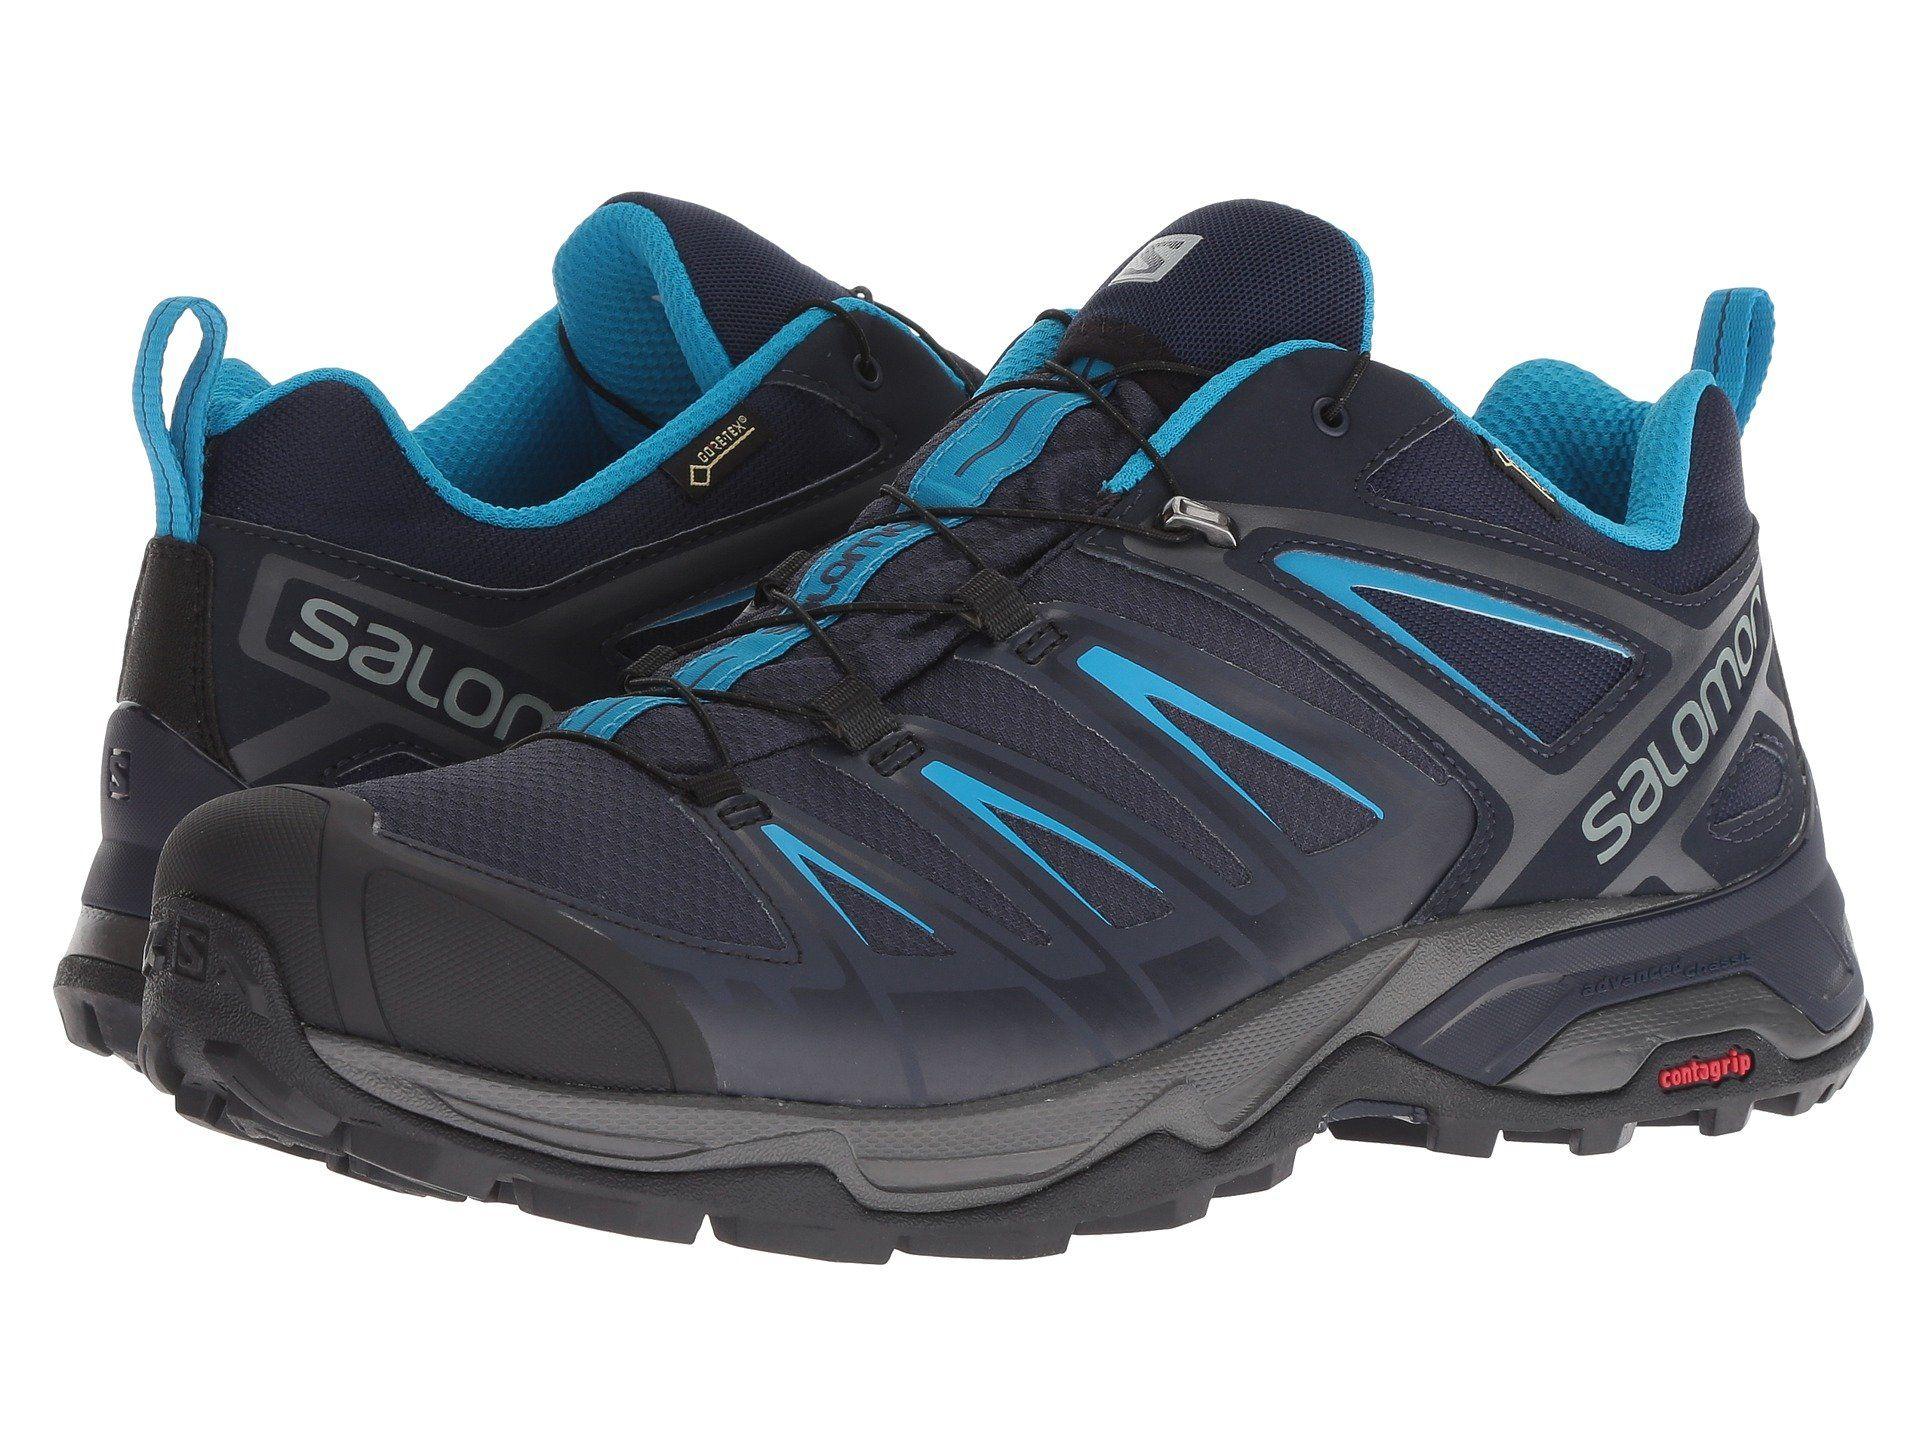 5b16532a154 Salomon X Ultra 3 GTX - Men's